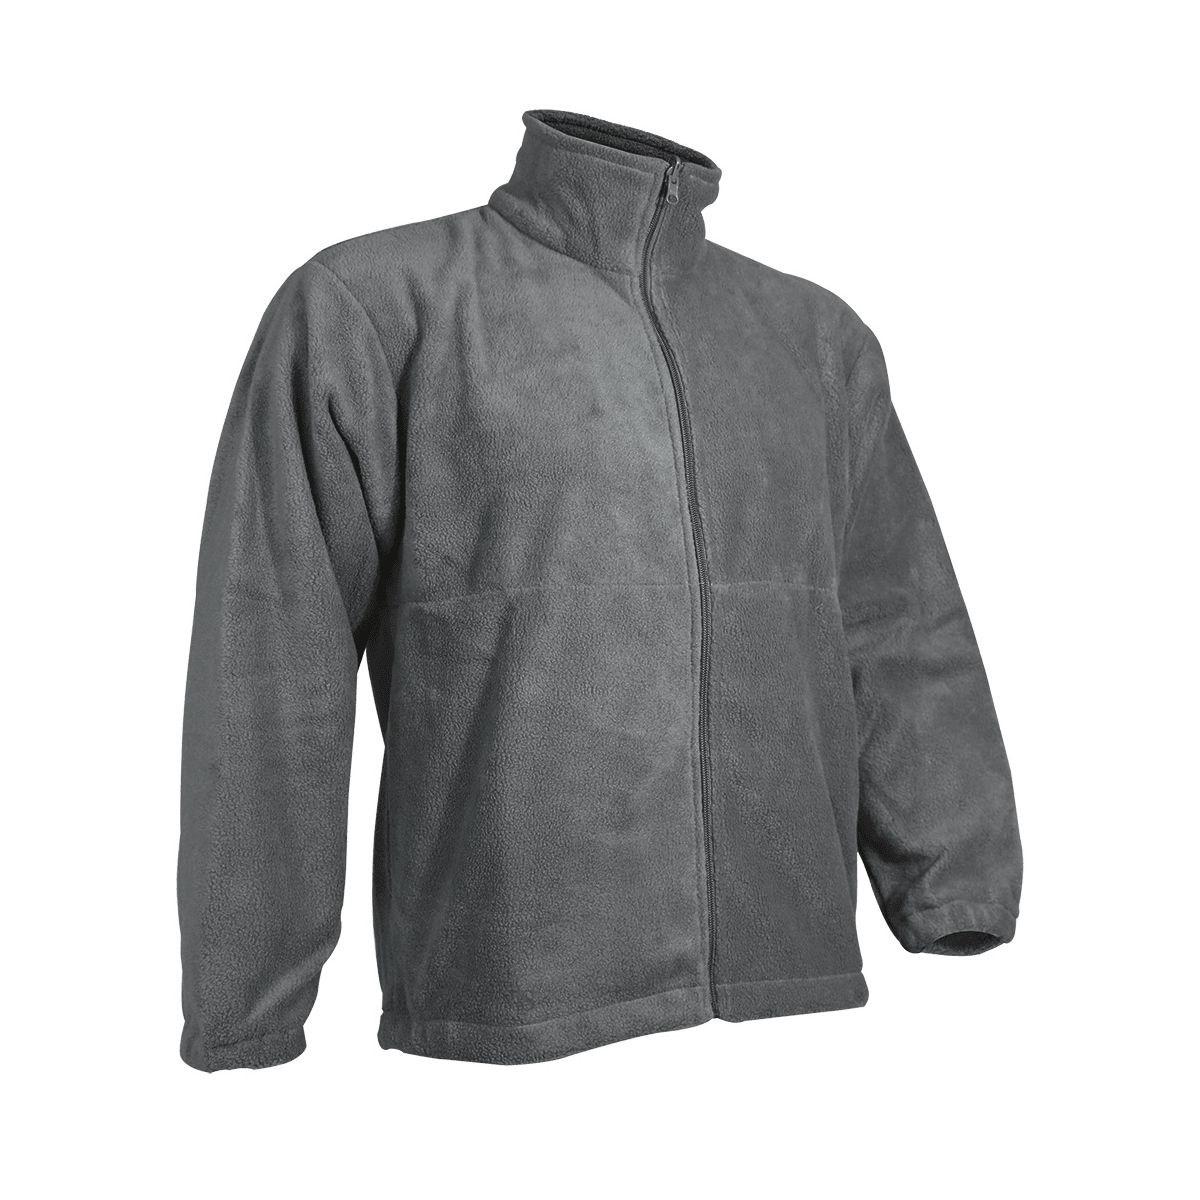 MICRO FLEECE hoodie ECWCS FOLIAGE TRU-SPEC 24350 L-11